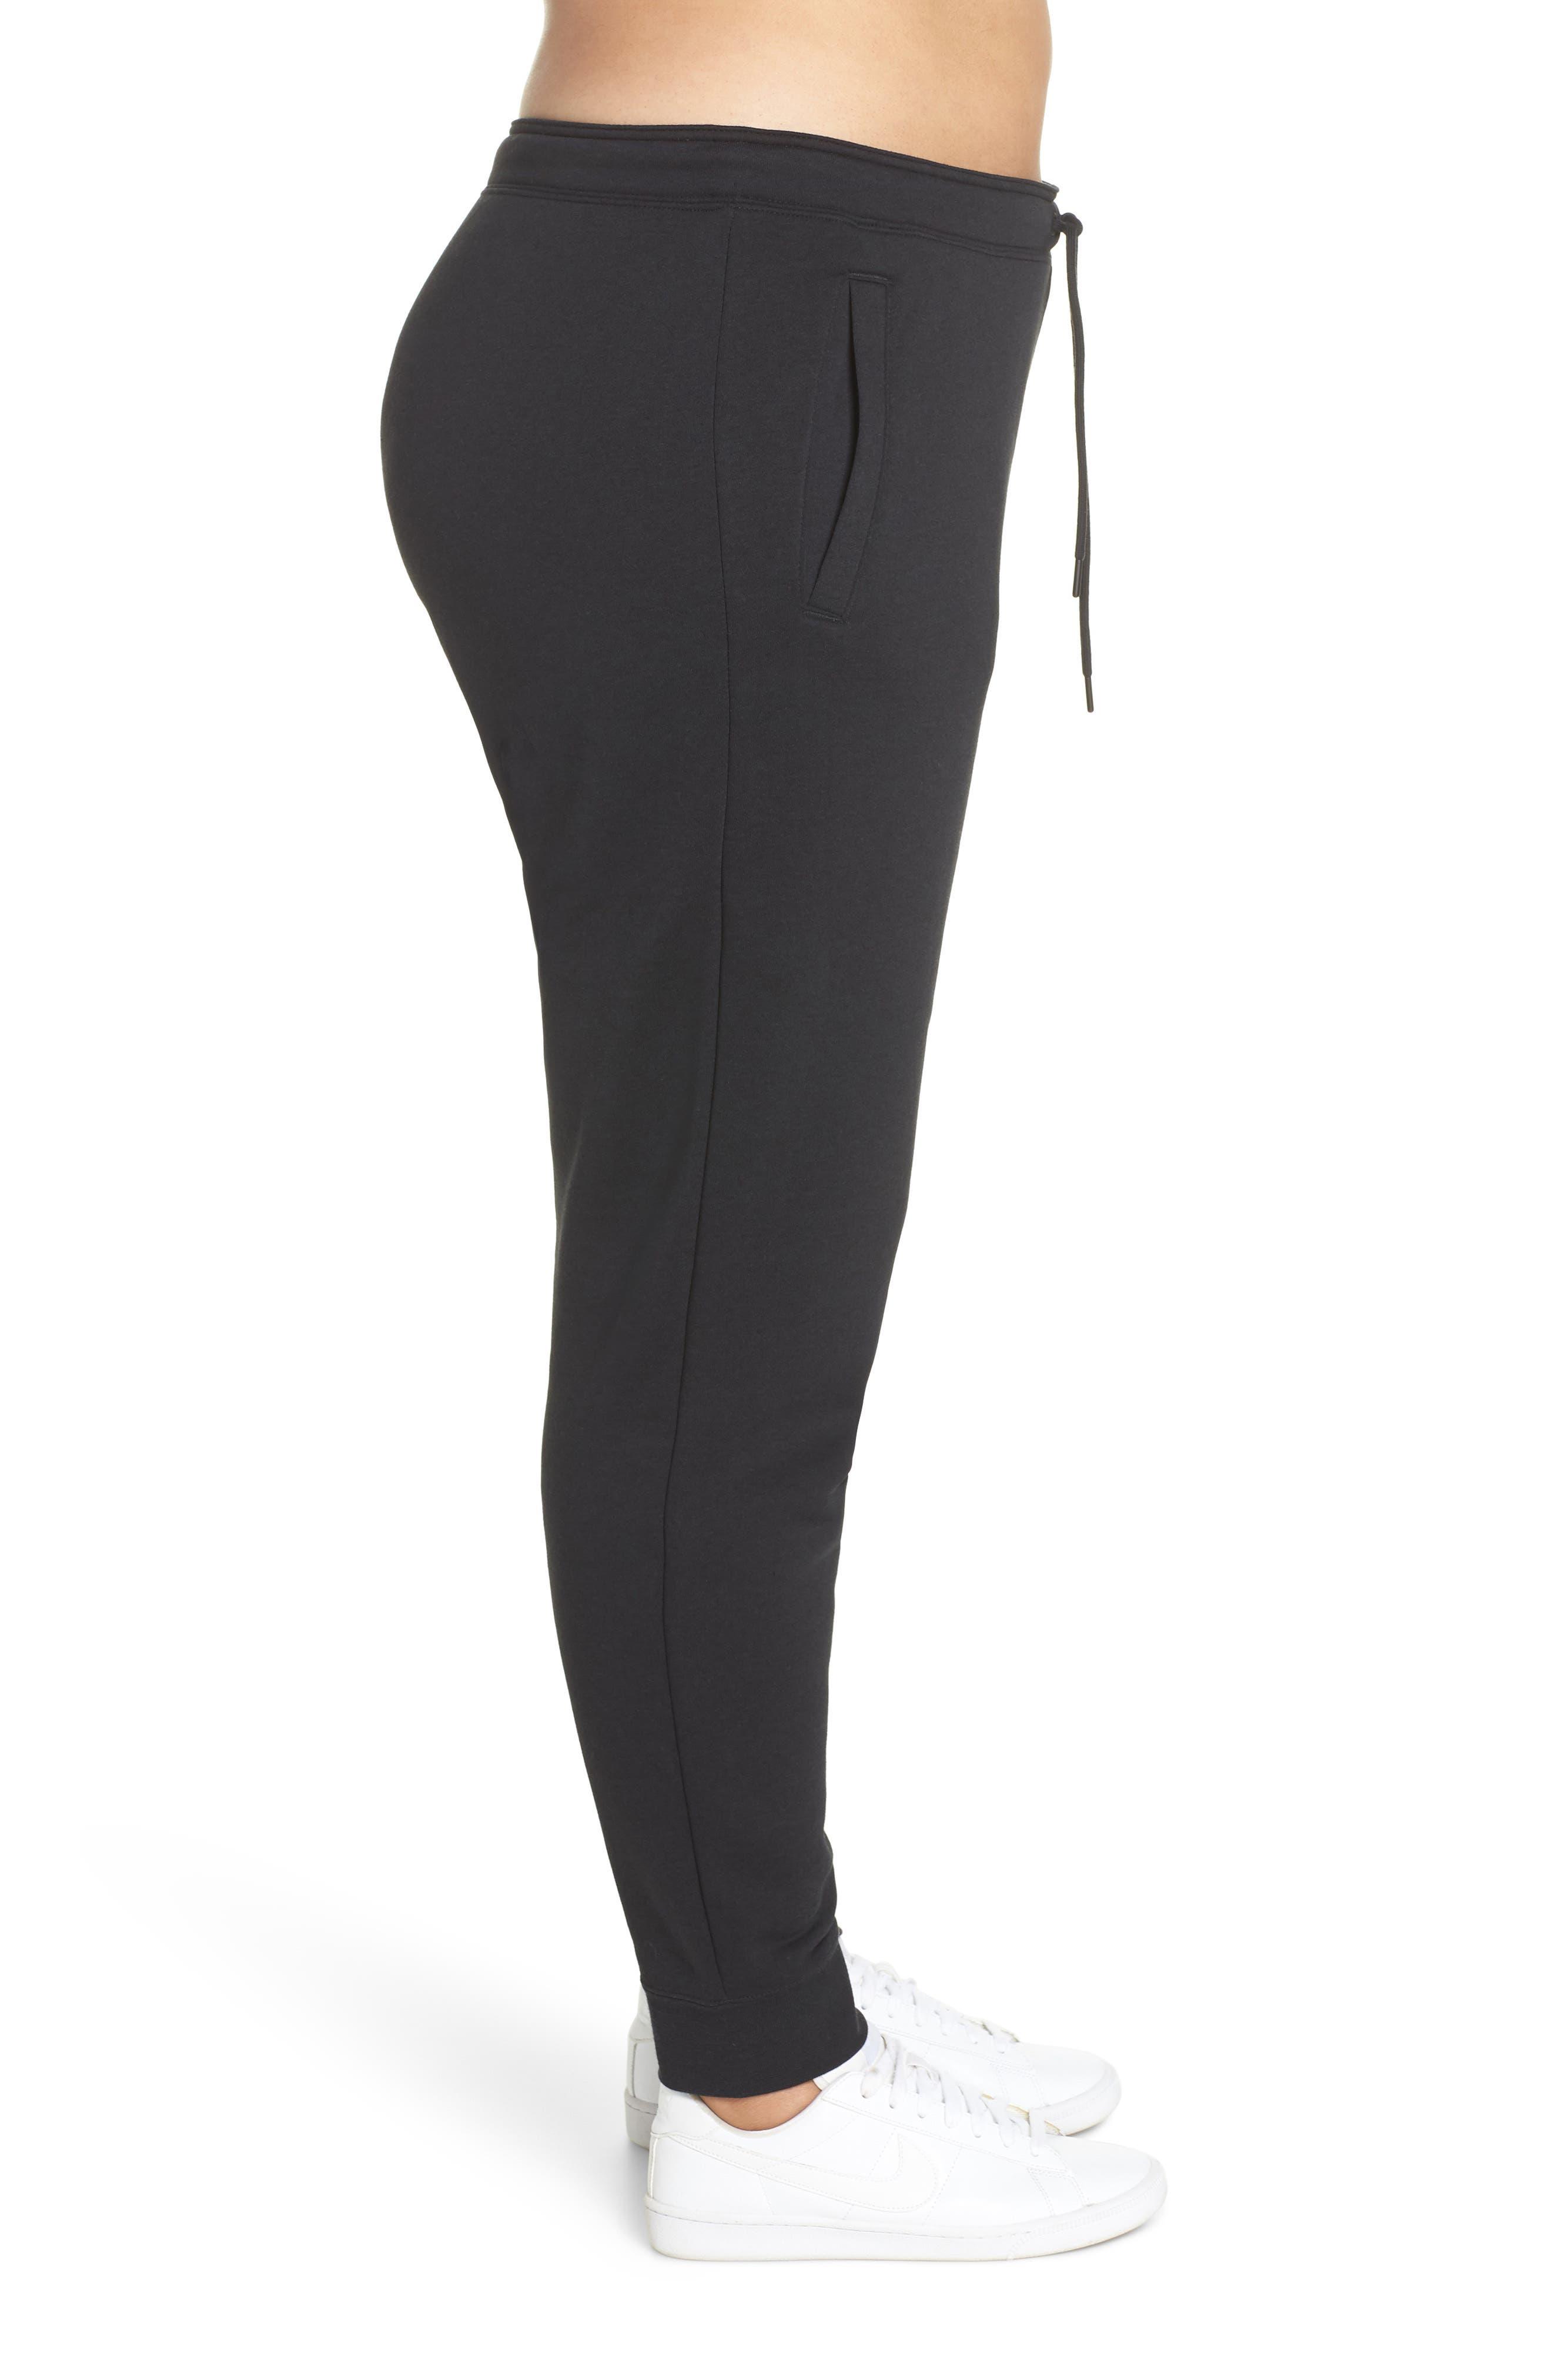 NIKE, Sportswear Rally High Rise Jogger Pants, Alternate thumbnail 4, color, BLACK/ BLACK/ WHITE